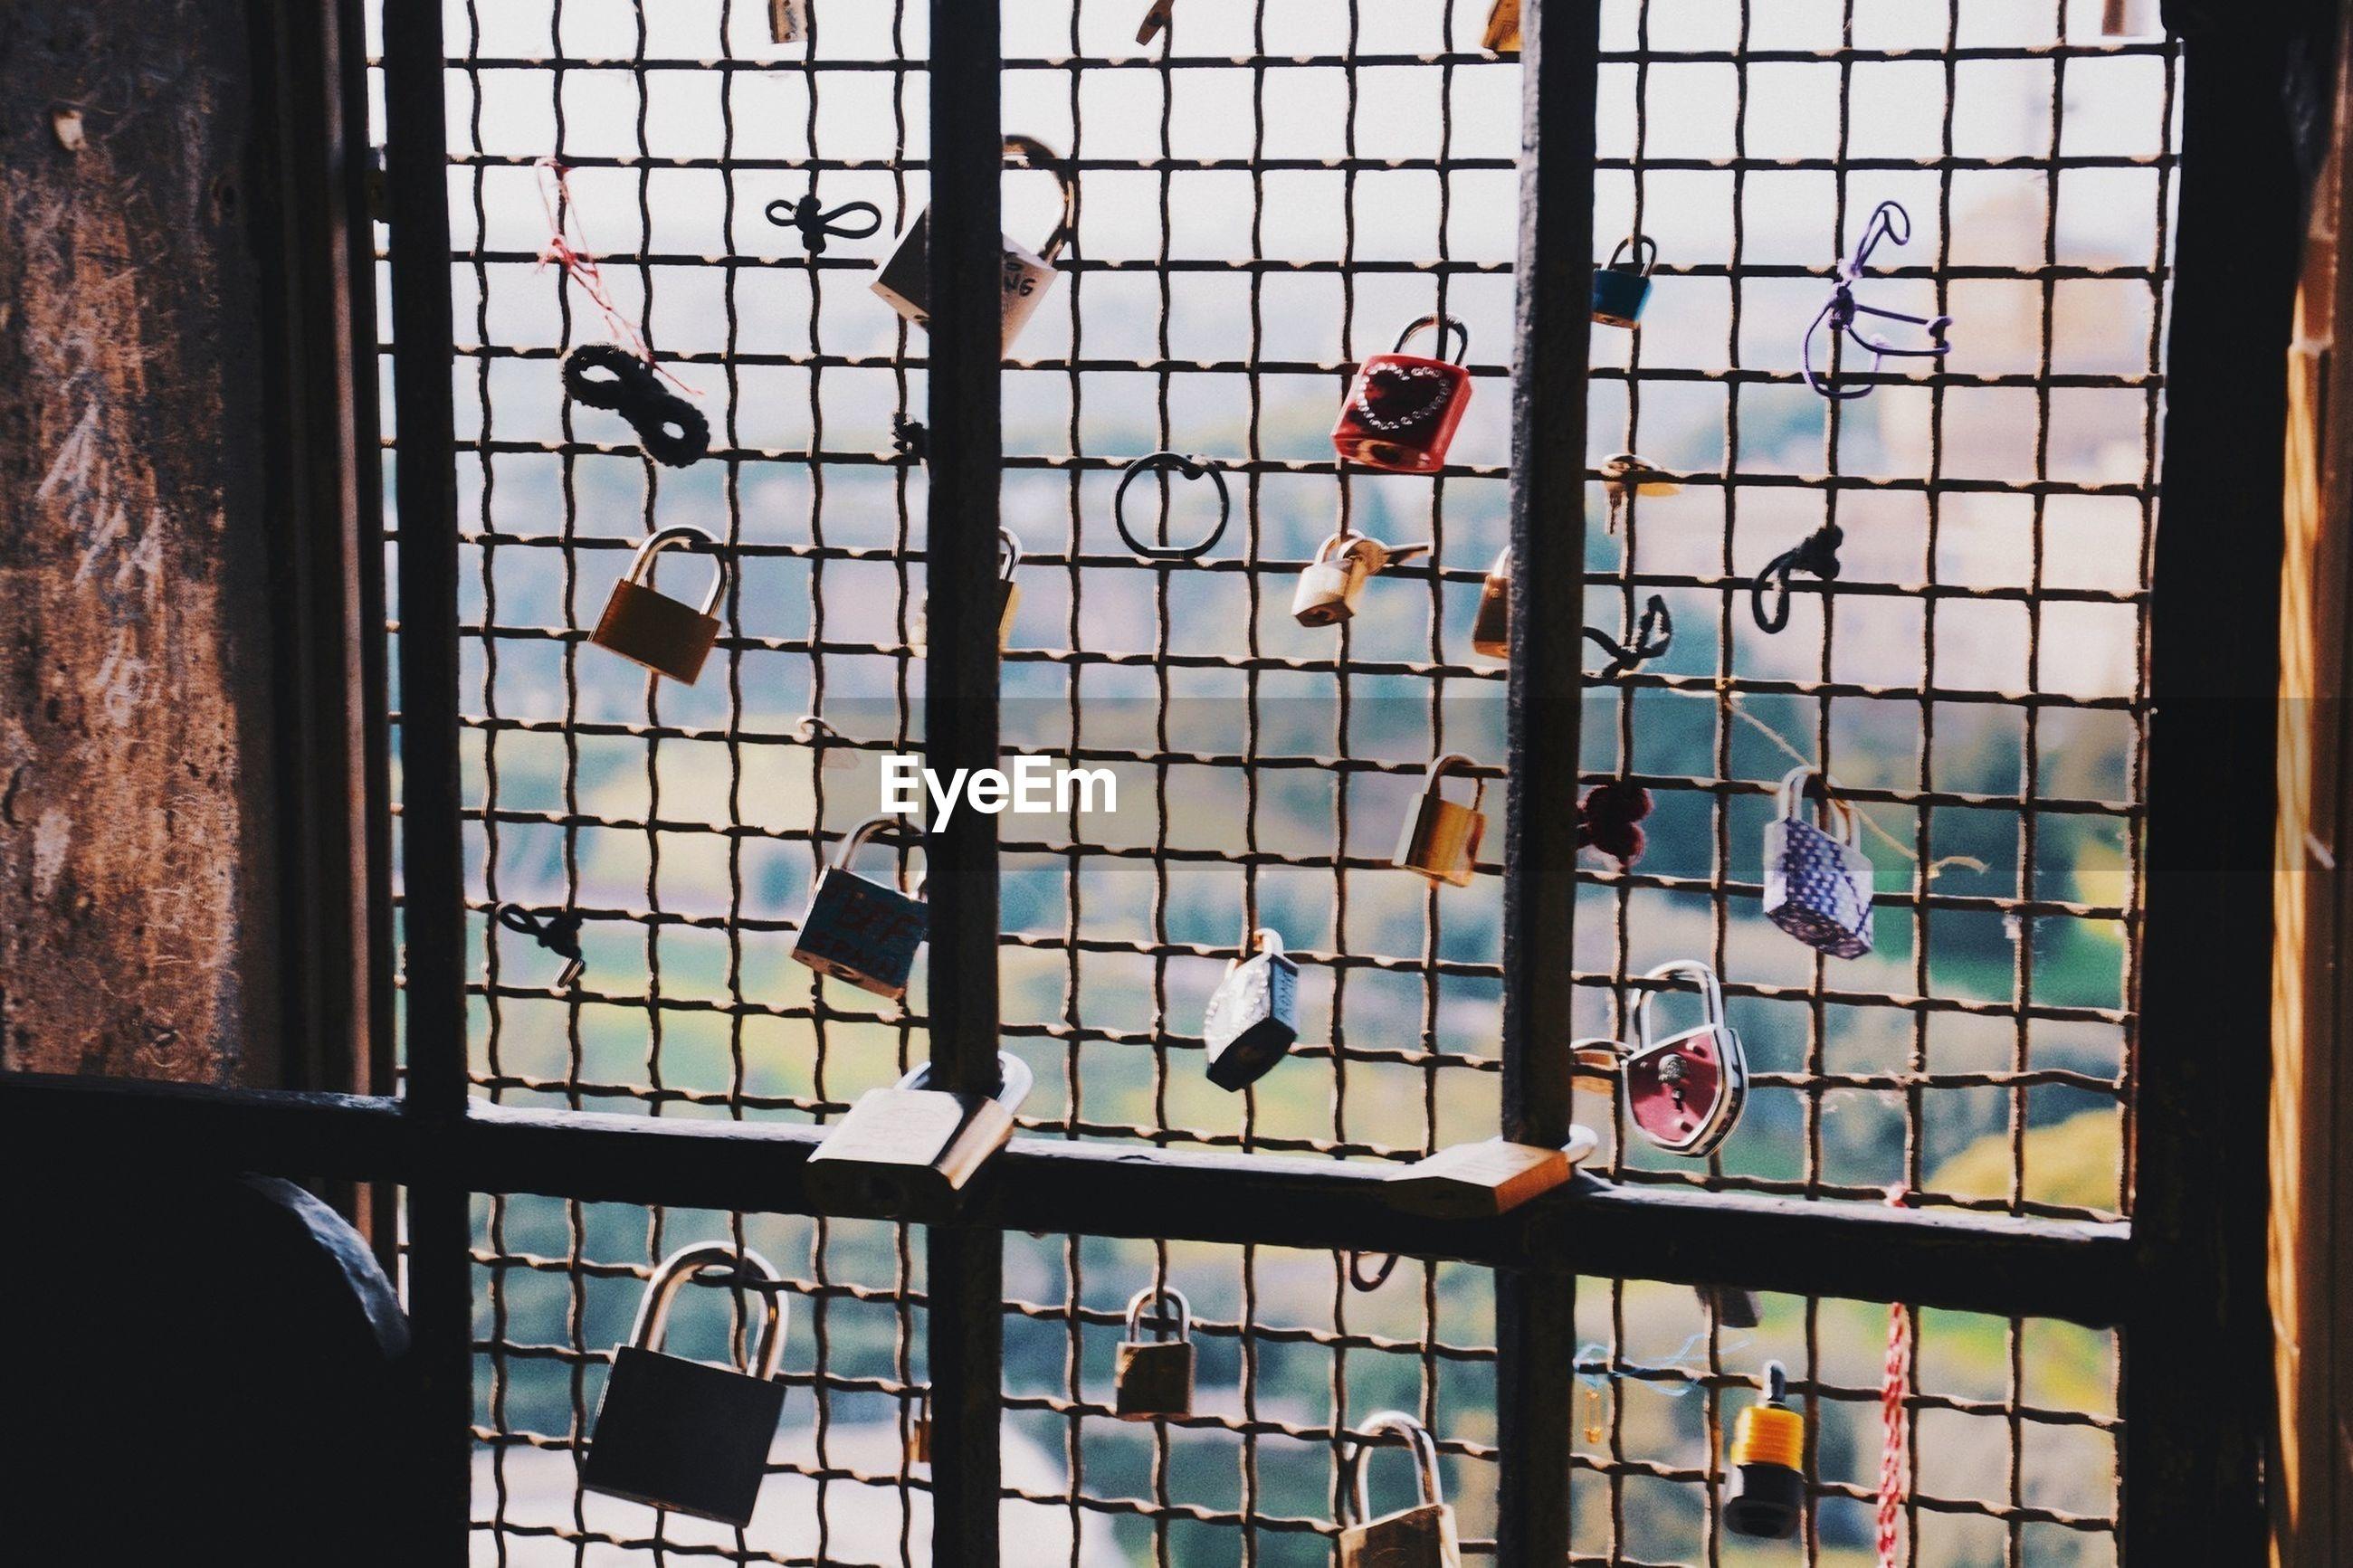 Love padlocks hanging on window fence